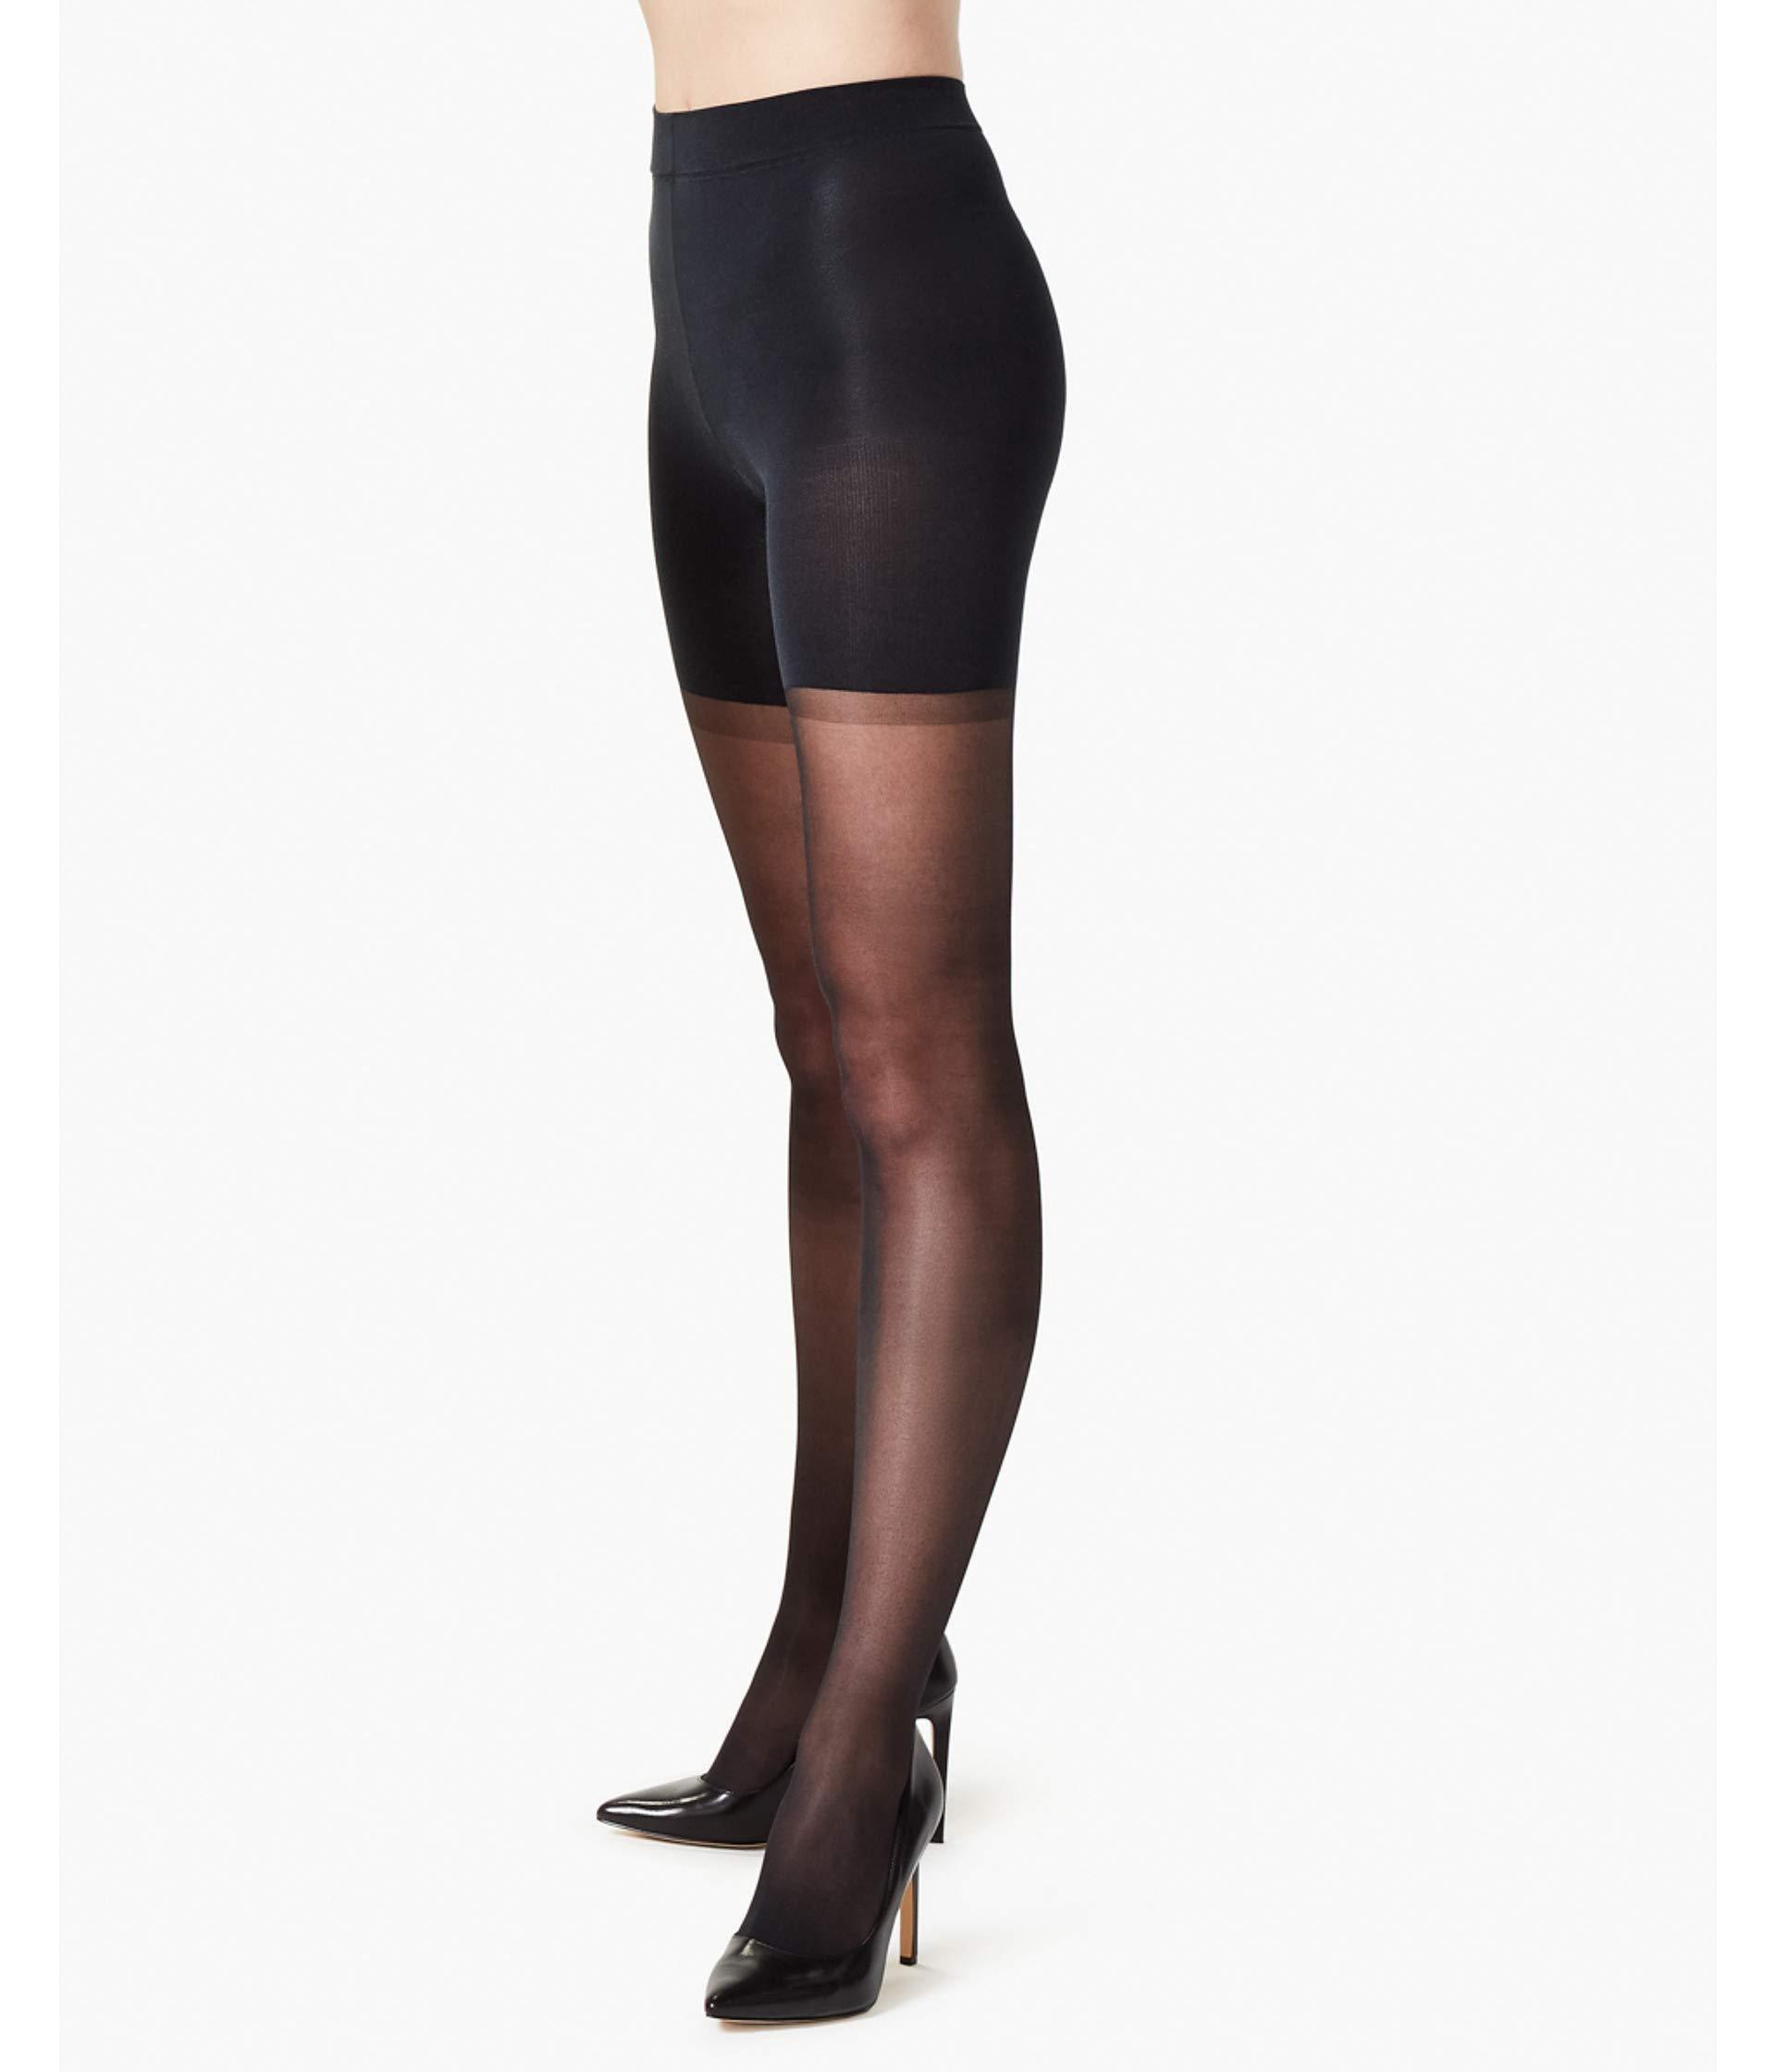 f6bcb9c07 Lyst - Spanx Regular-waist Sheer (s3) Sheer Hose in Black